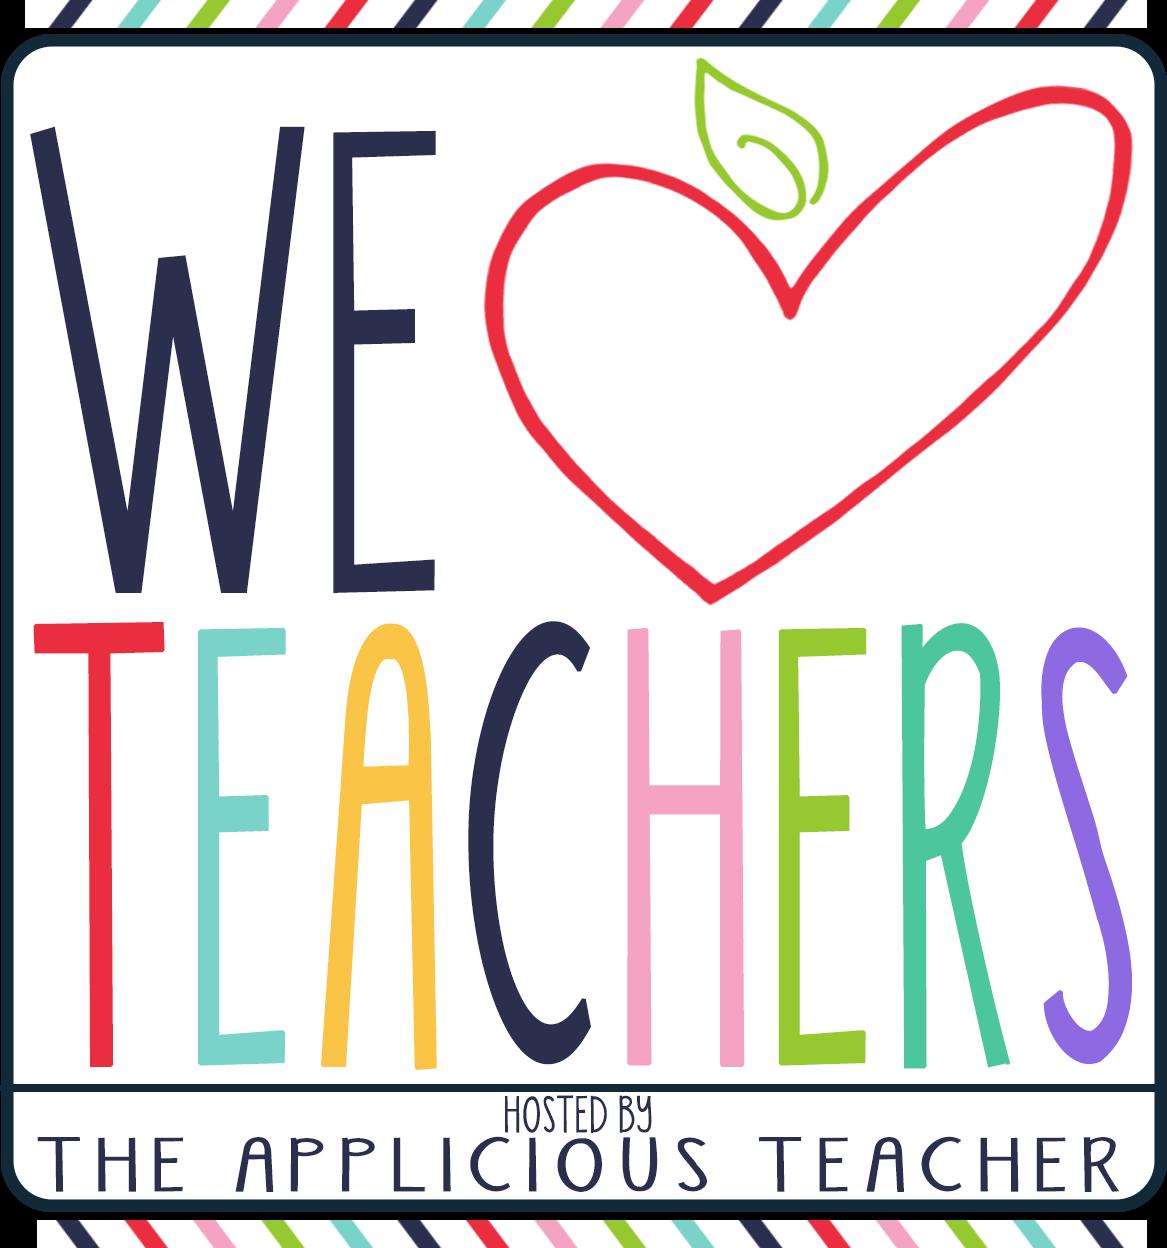 clipart for teachers day - photo #14